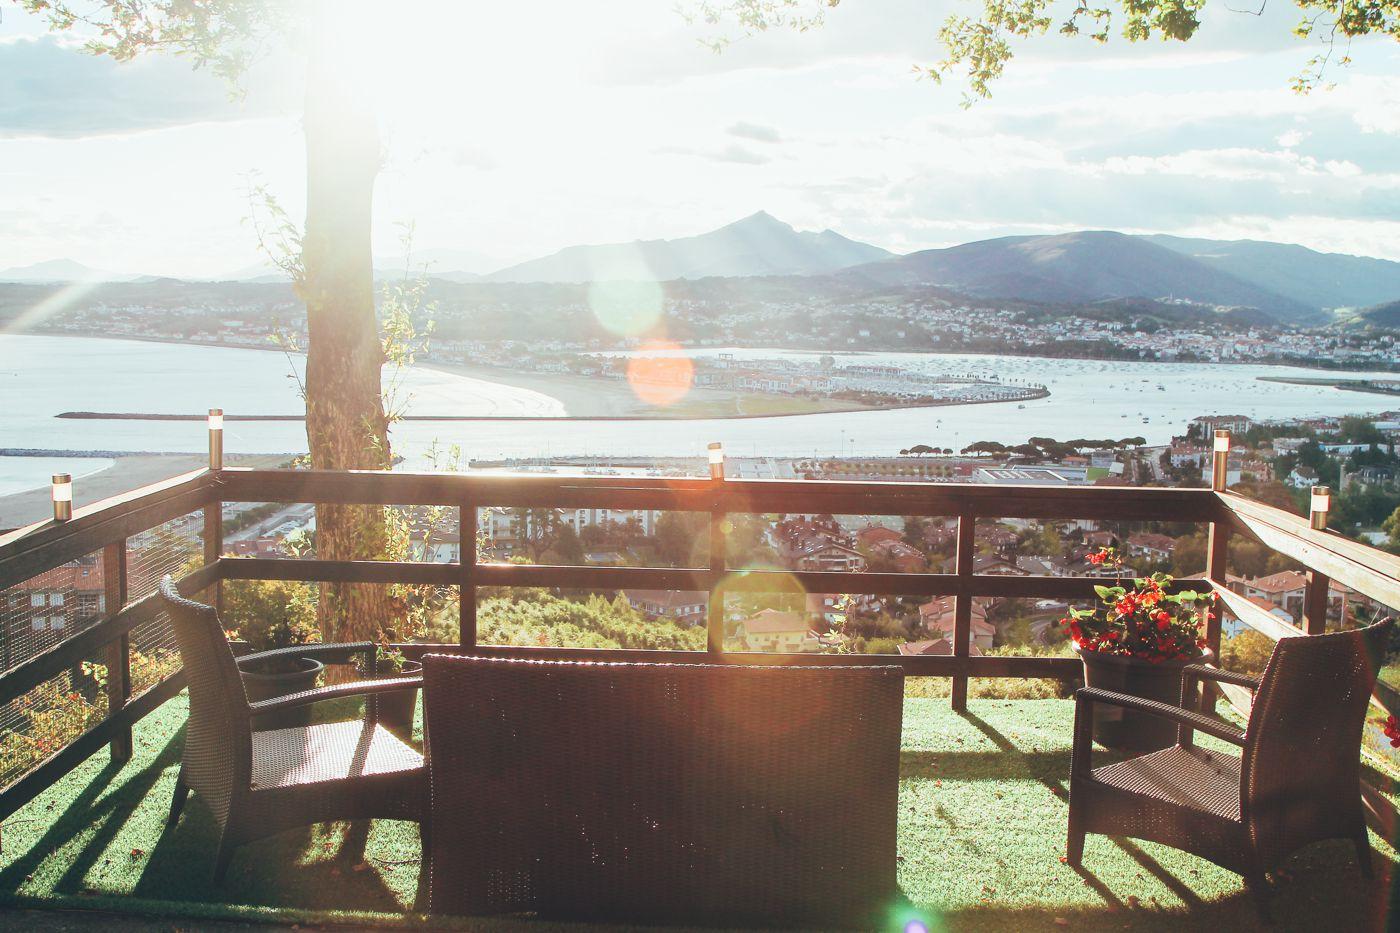 Hotel Higeralde, Gipuzkoa, Basque Country, Travel, Bed and Breakfast, Accomodation (6)